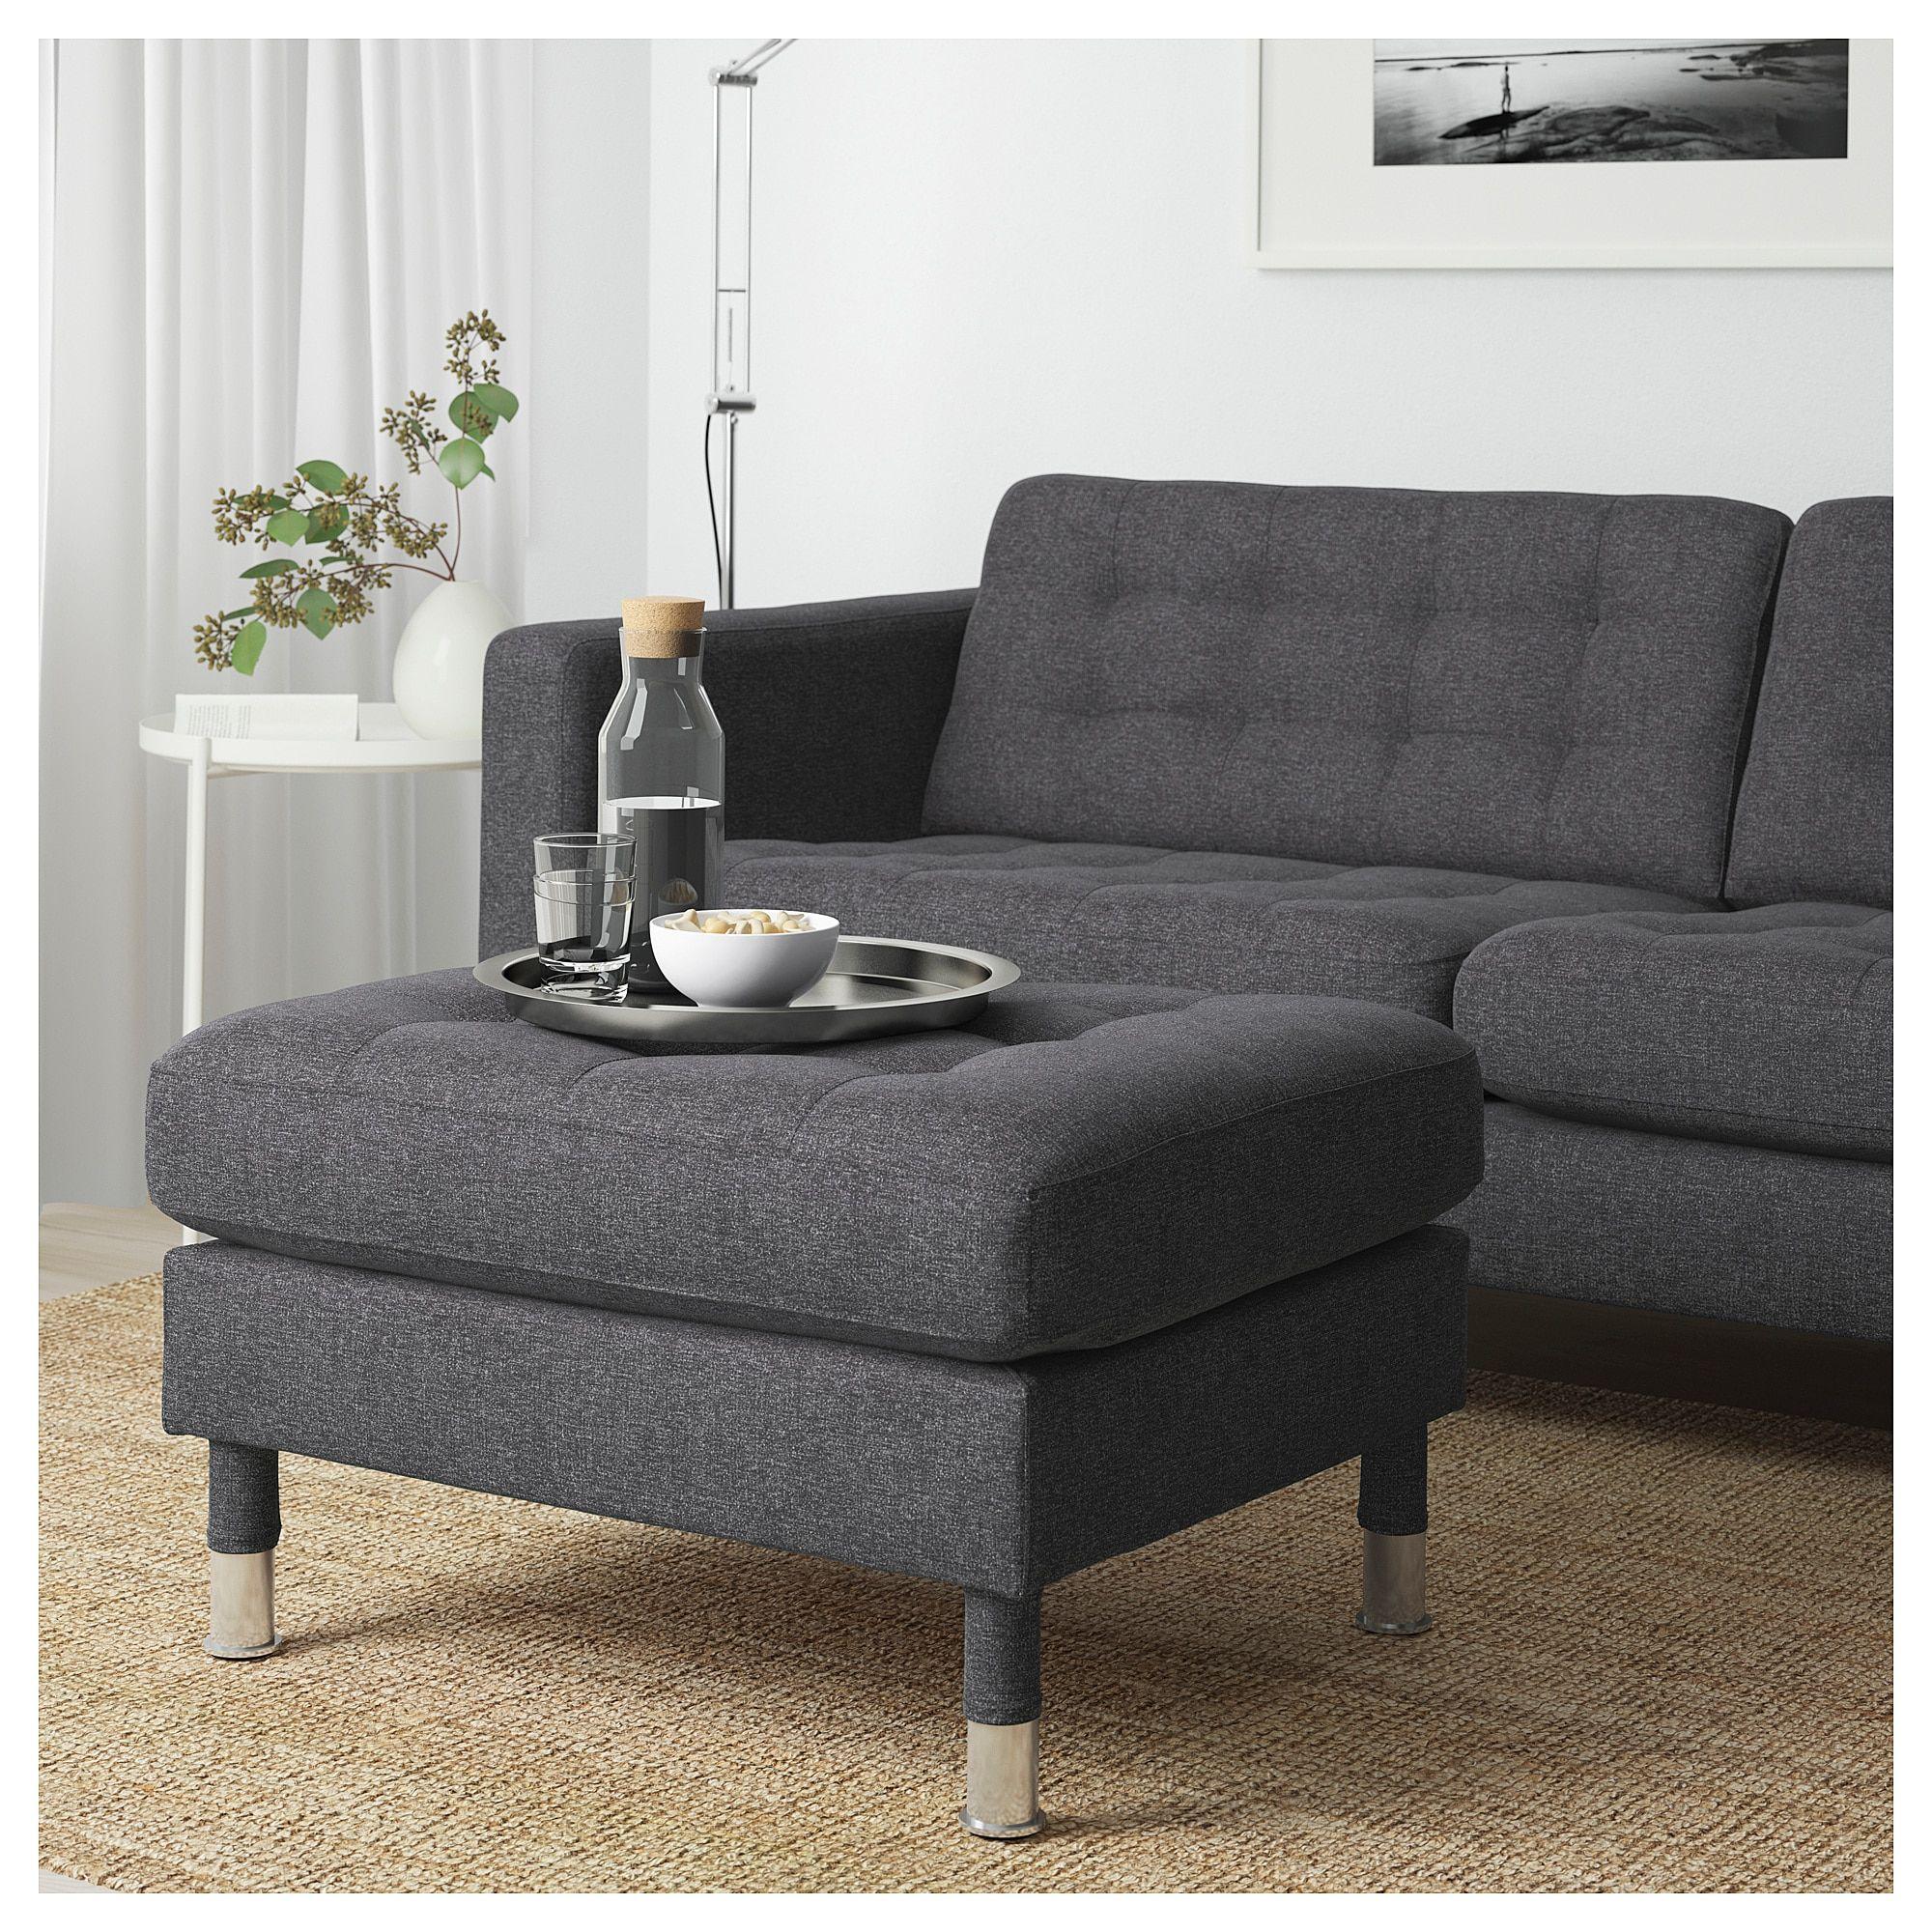 furniture and home furnishings  ikea landskrona ikea